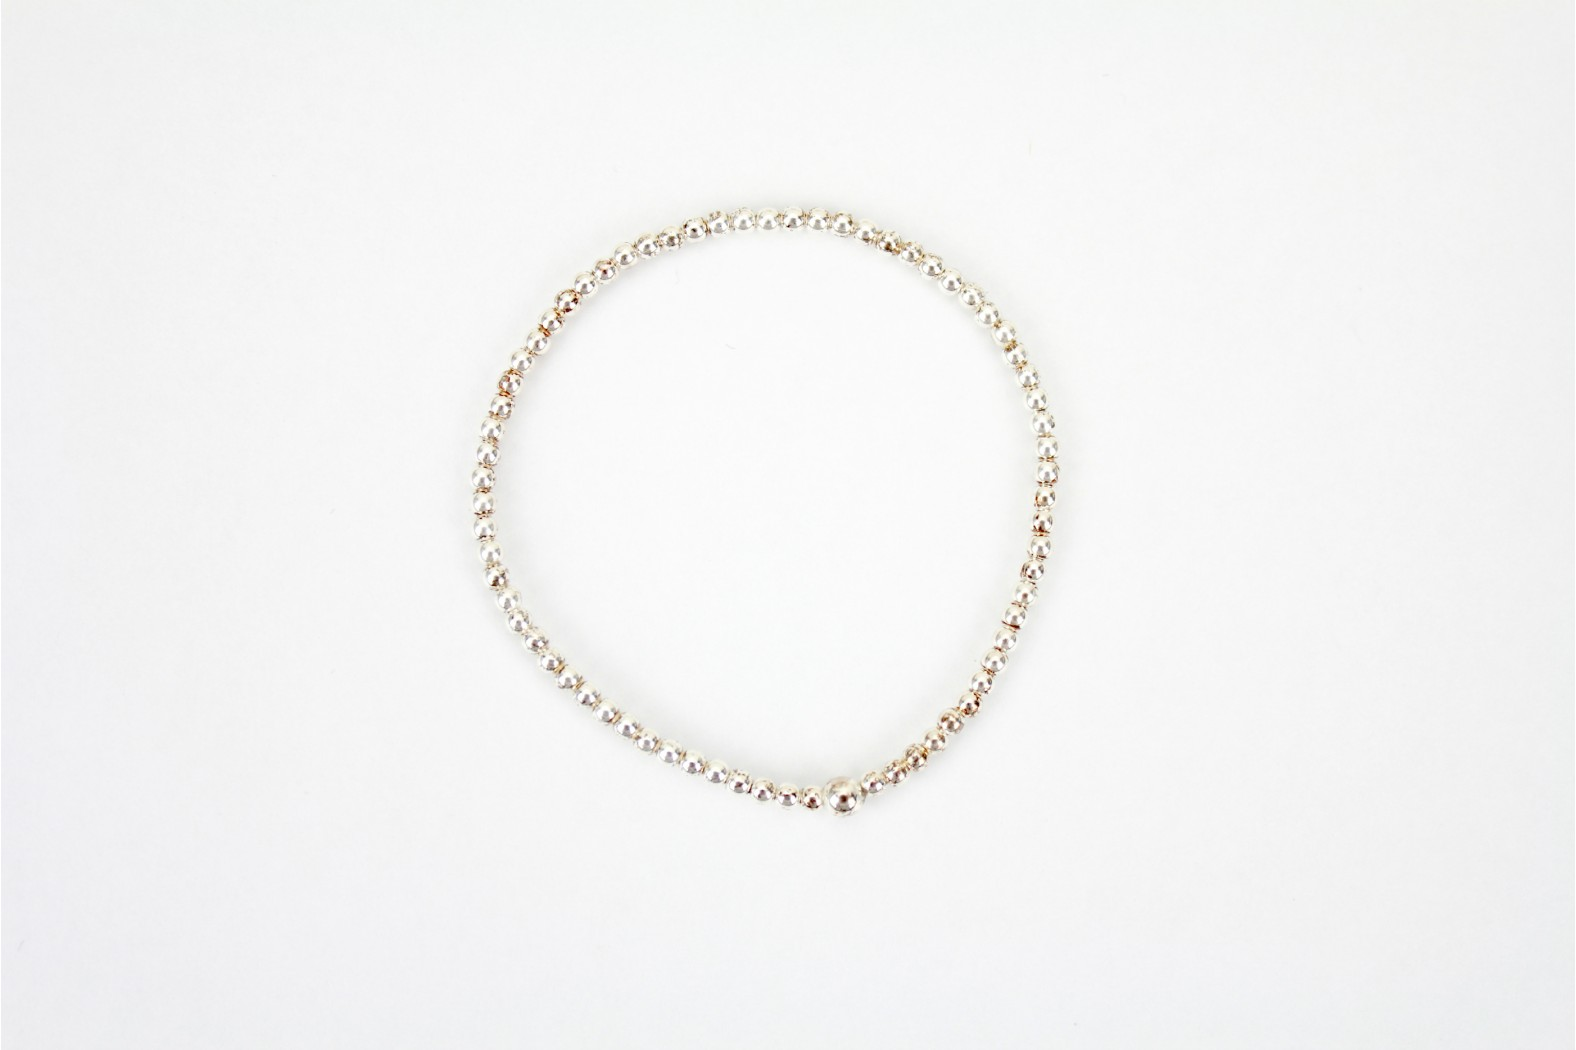 Silver ball small 40mm diameter Elasticated Bracelet